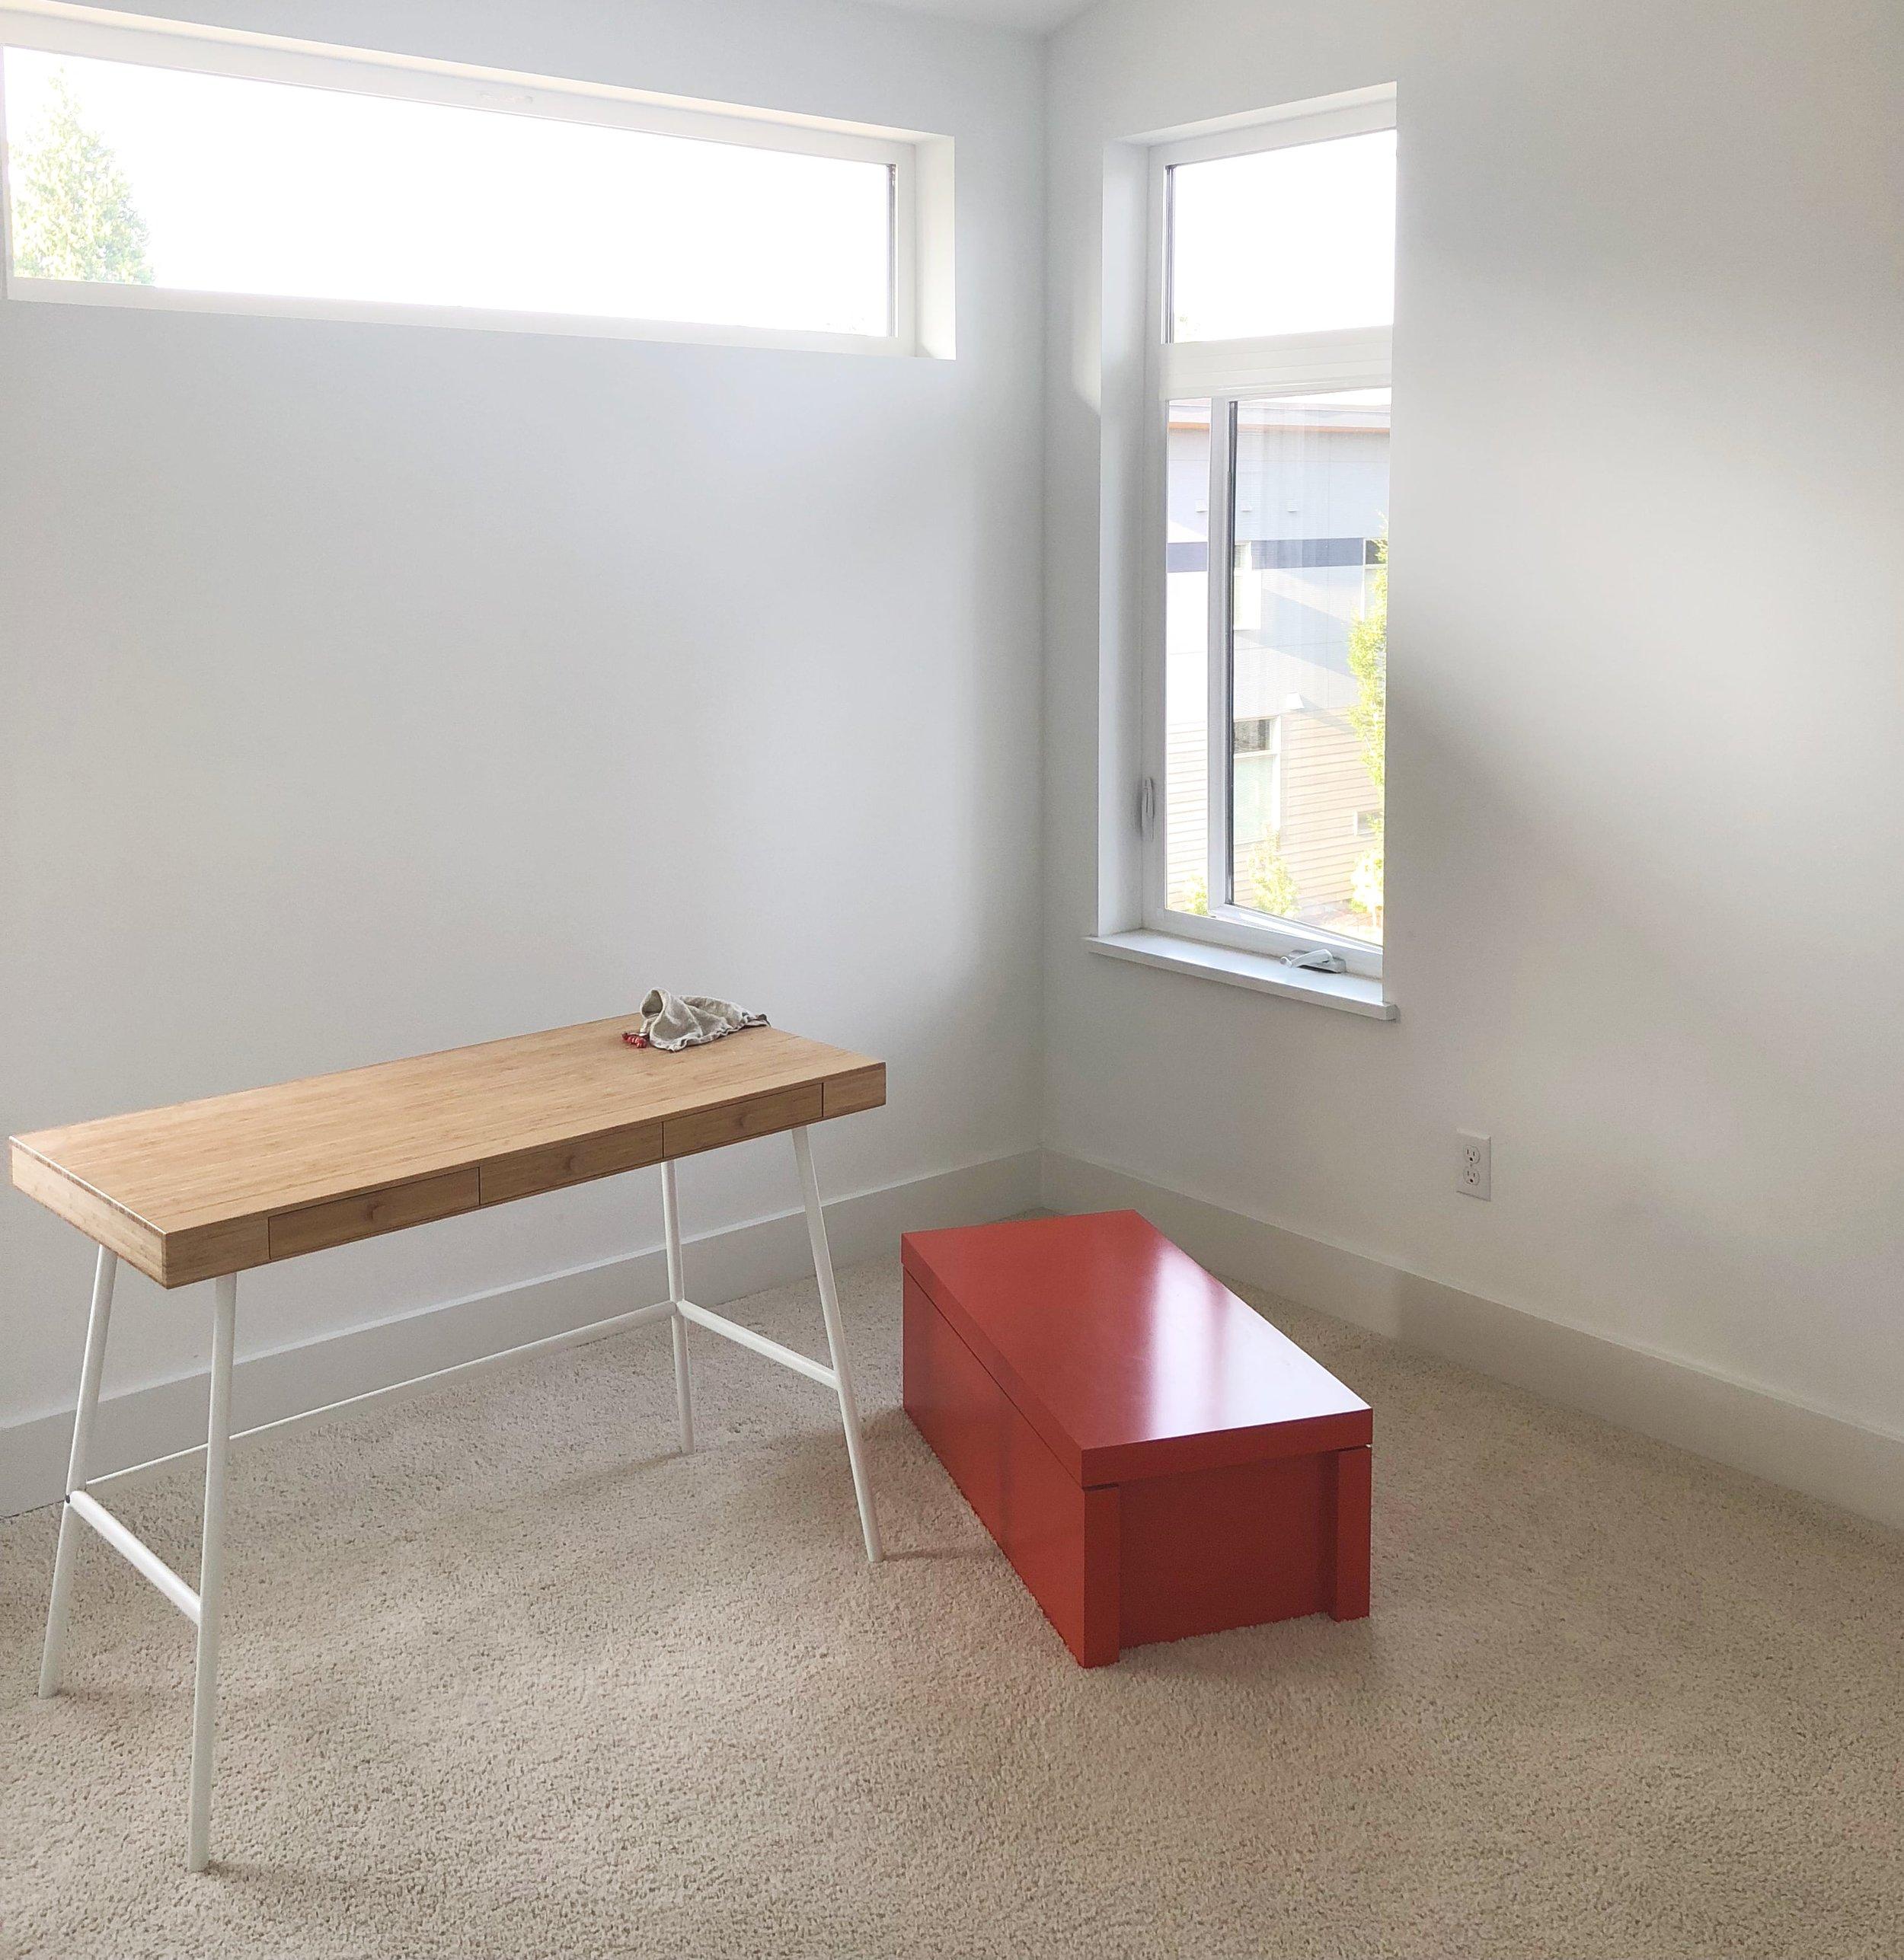 before&after - guest bedroom design